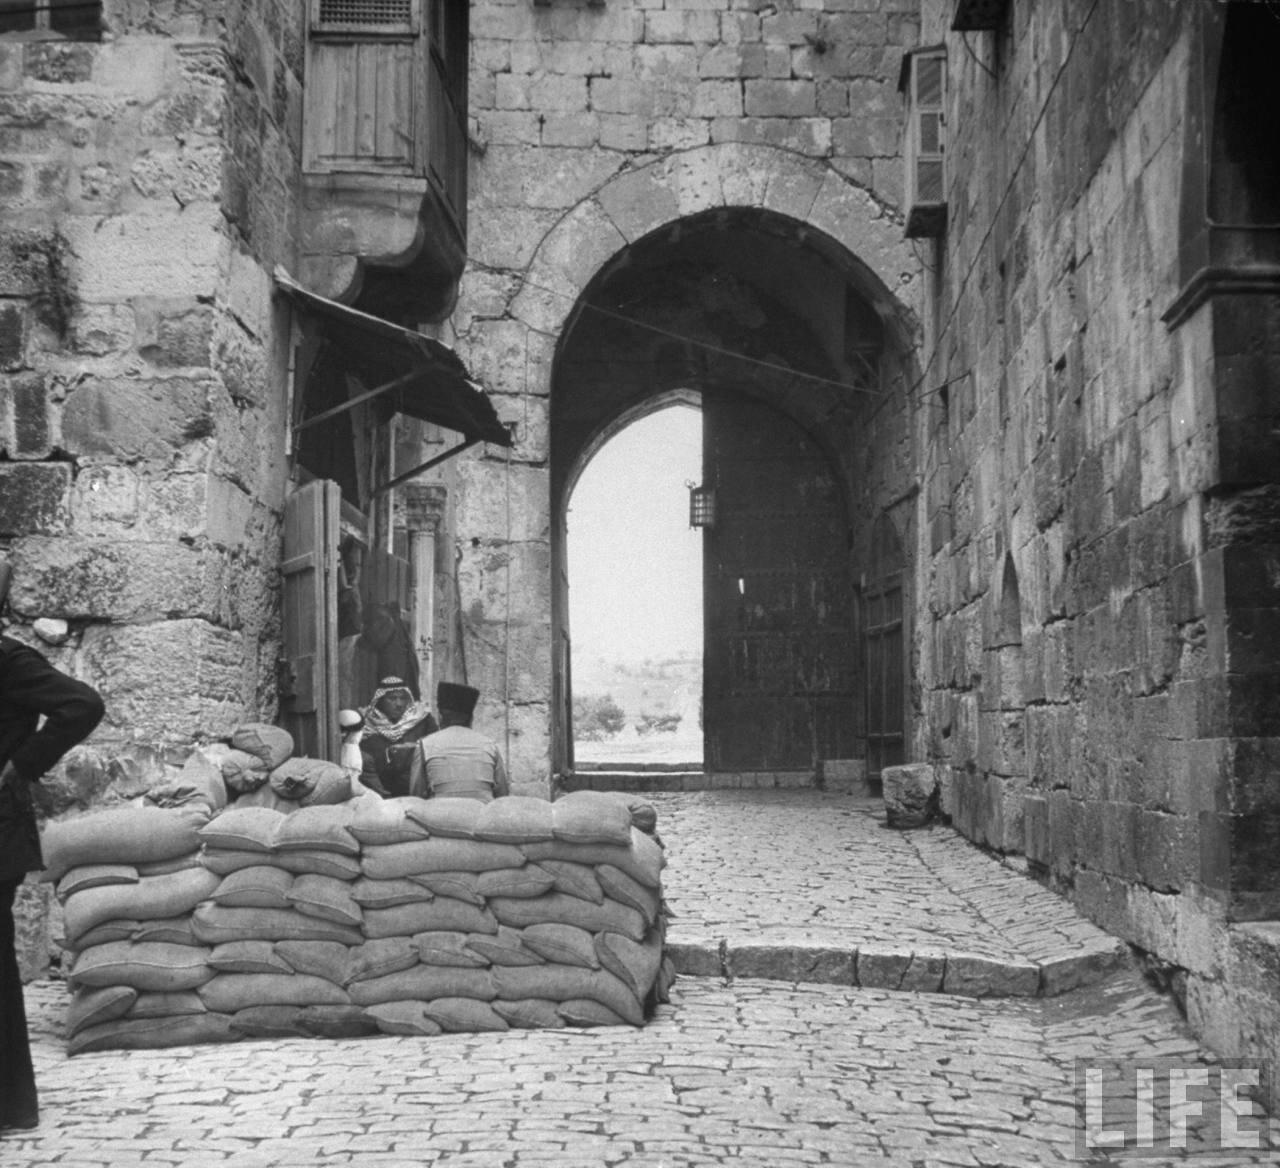 1948. Израильские солдаты сооружают баррикаду